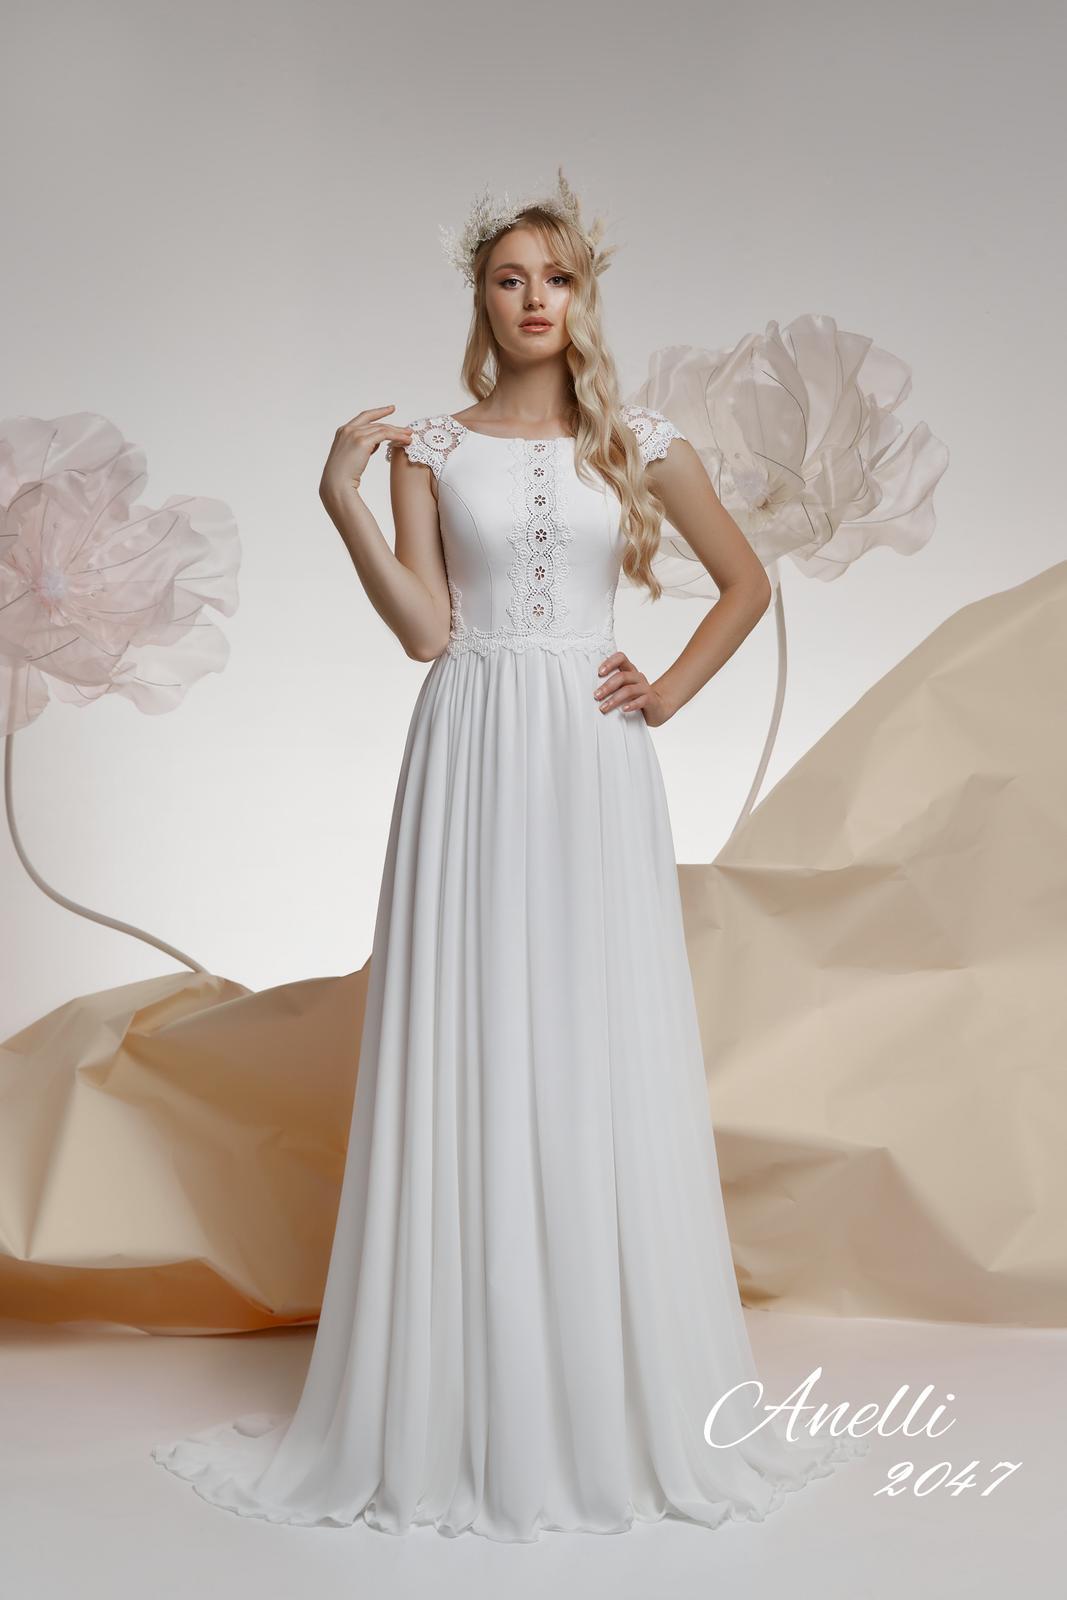 Svadobné šaty - Imagine 2047 - Obrázok č. 1